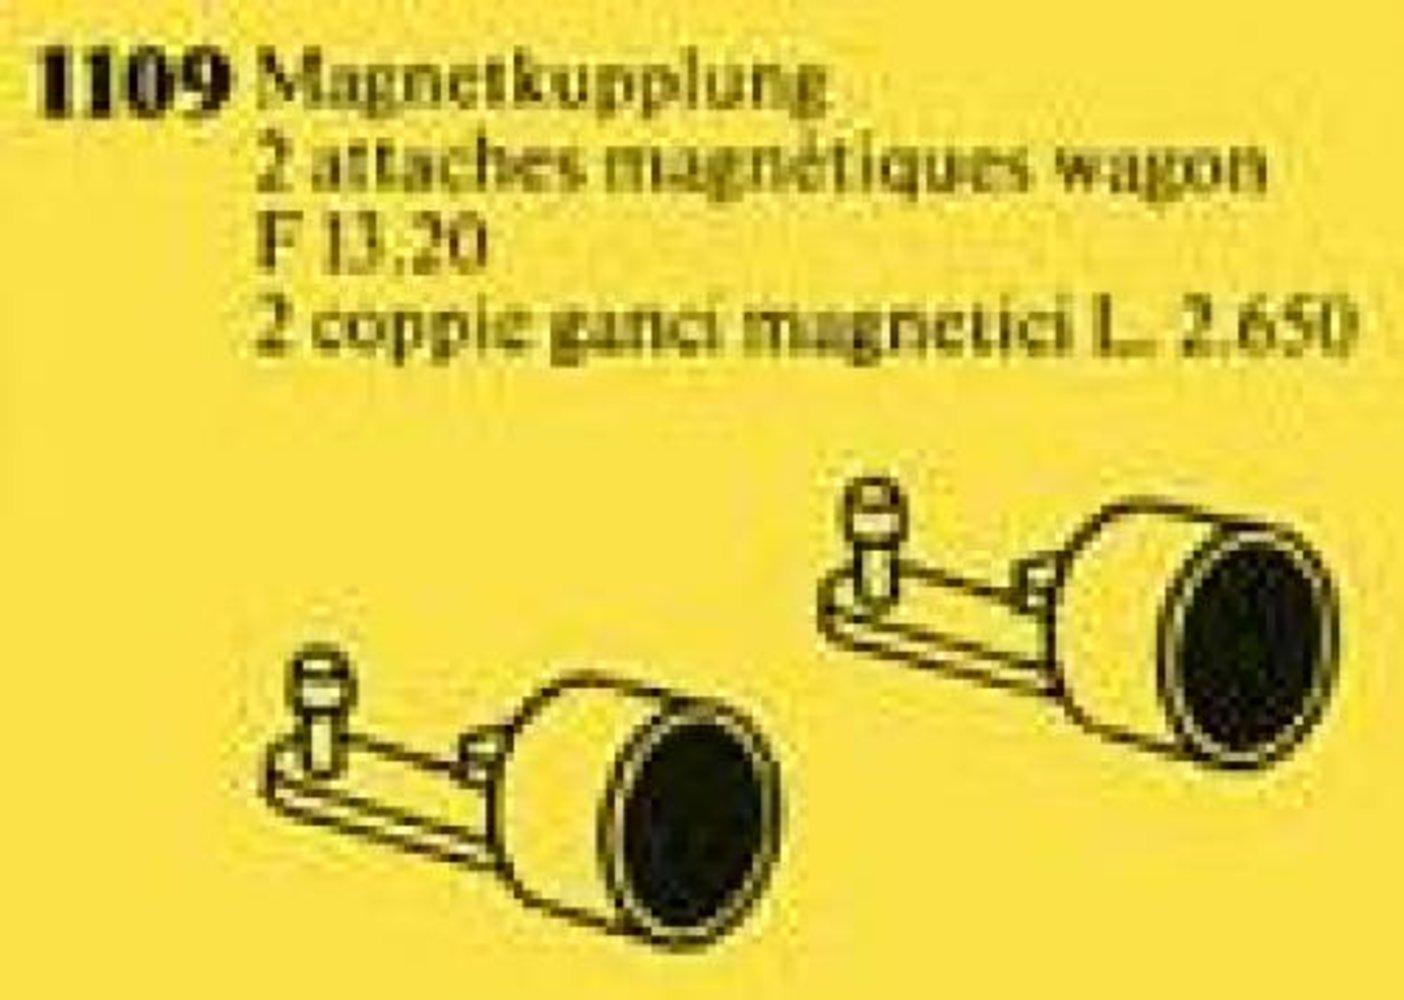 Magnetic Couplings for Railway Car